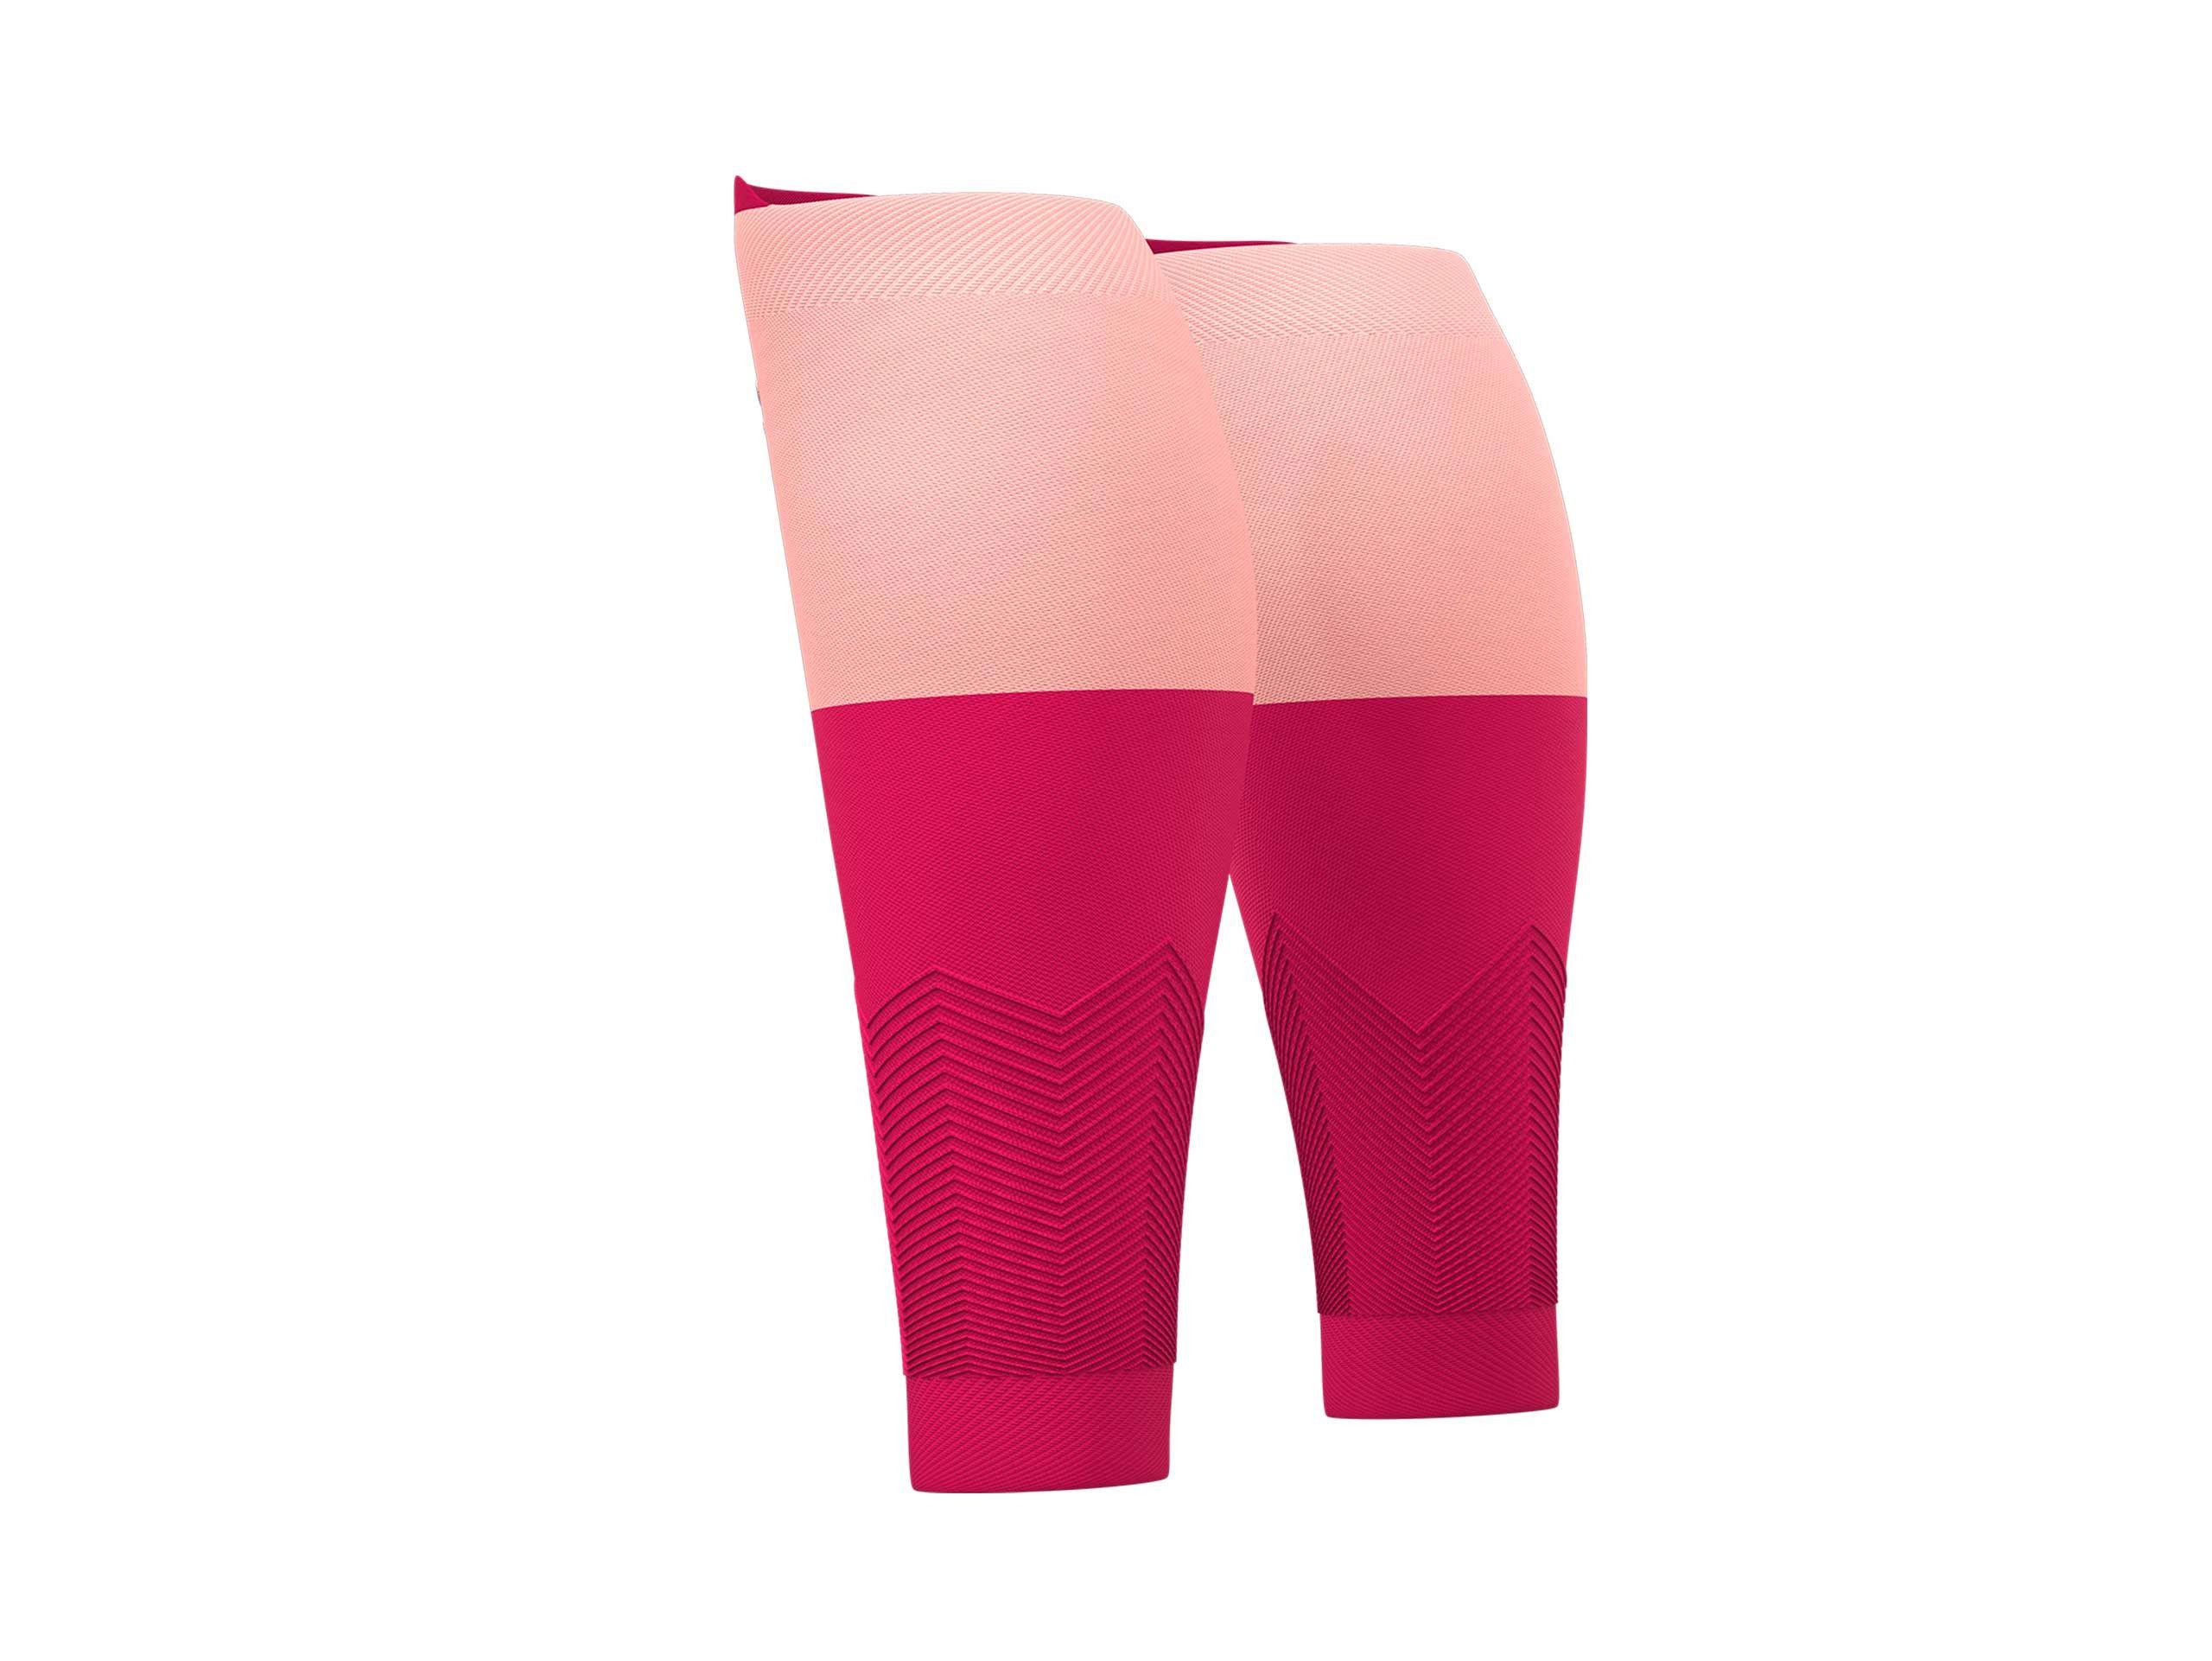 R2v2 calf sleeves pink